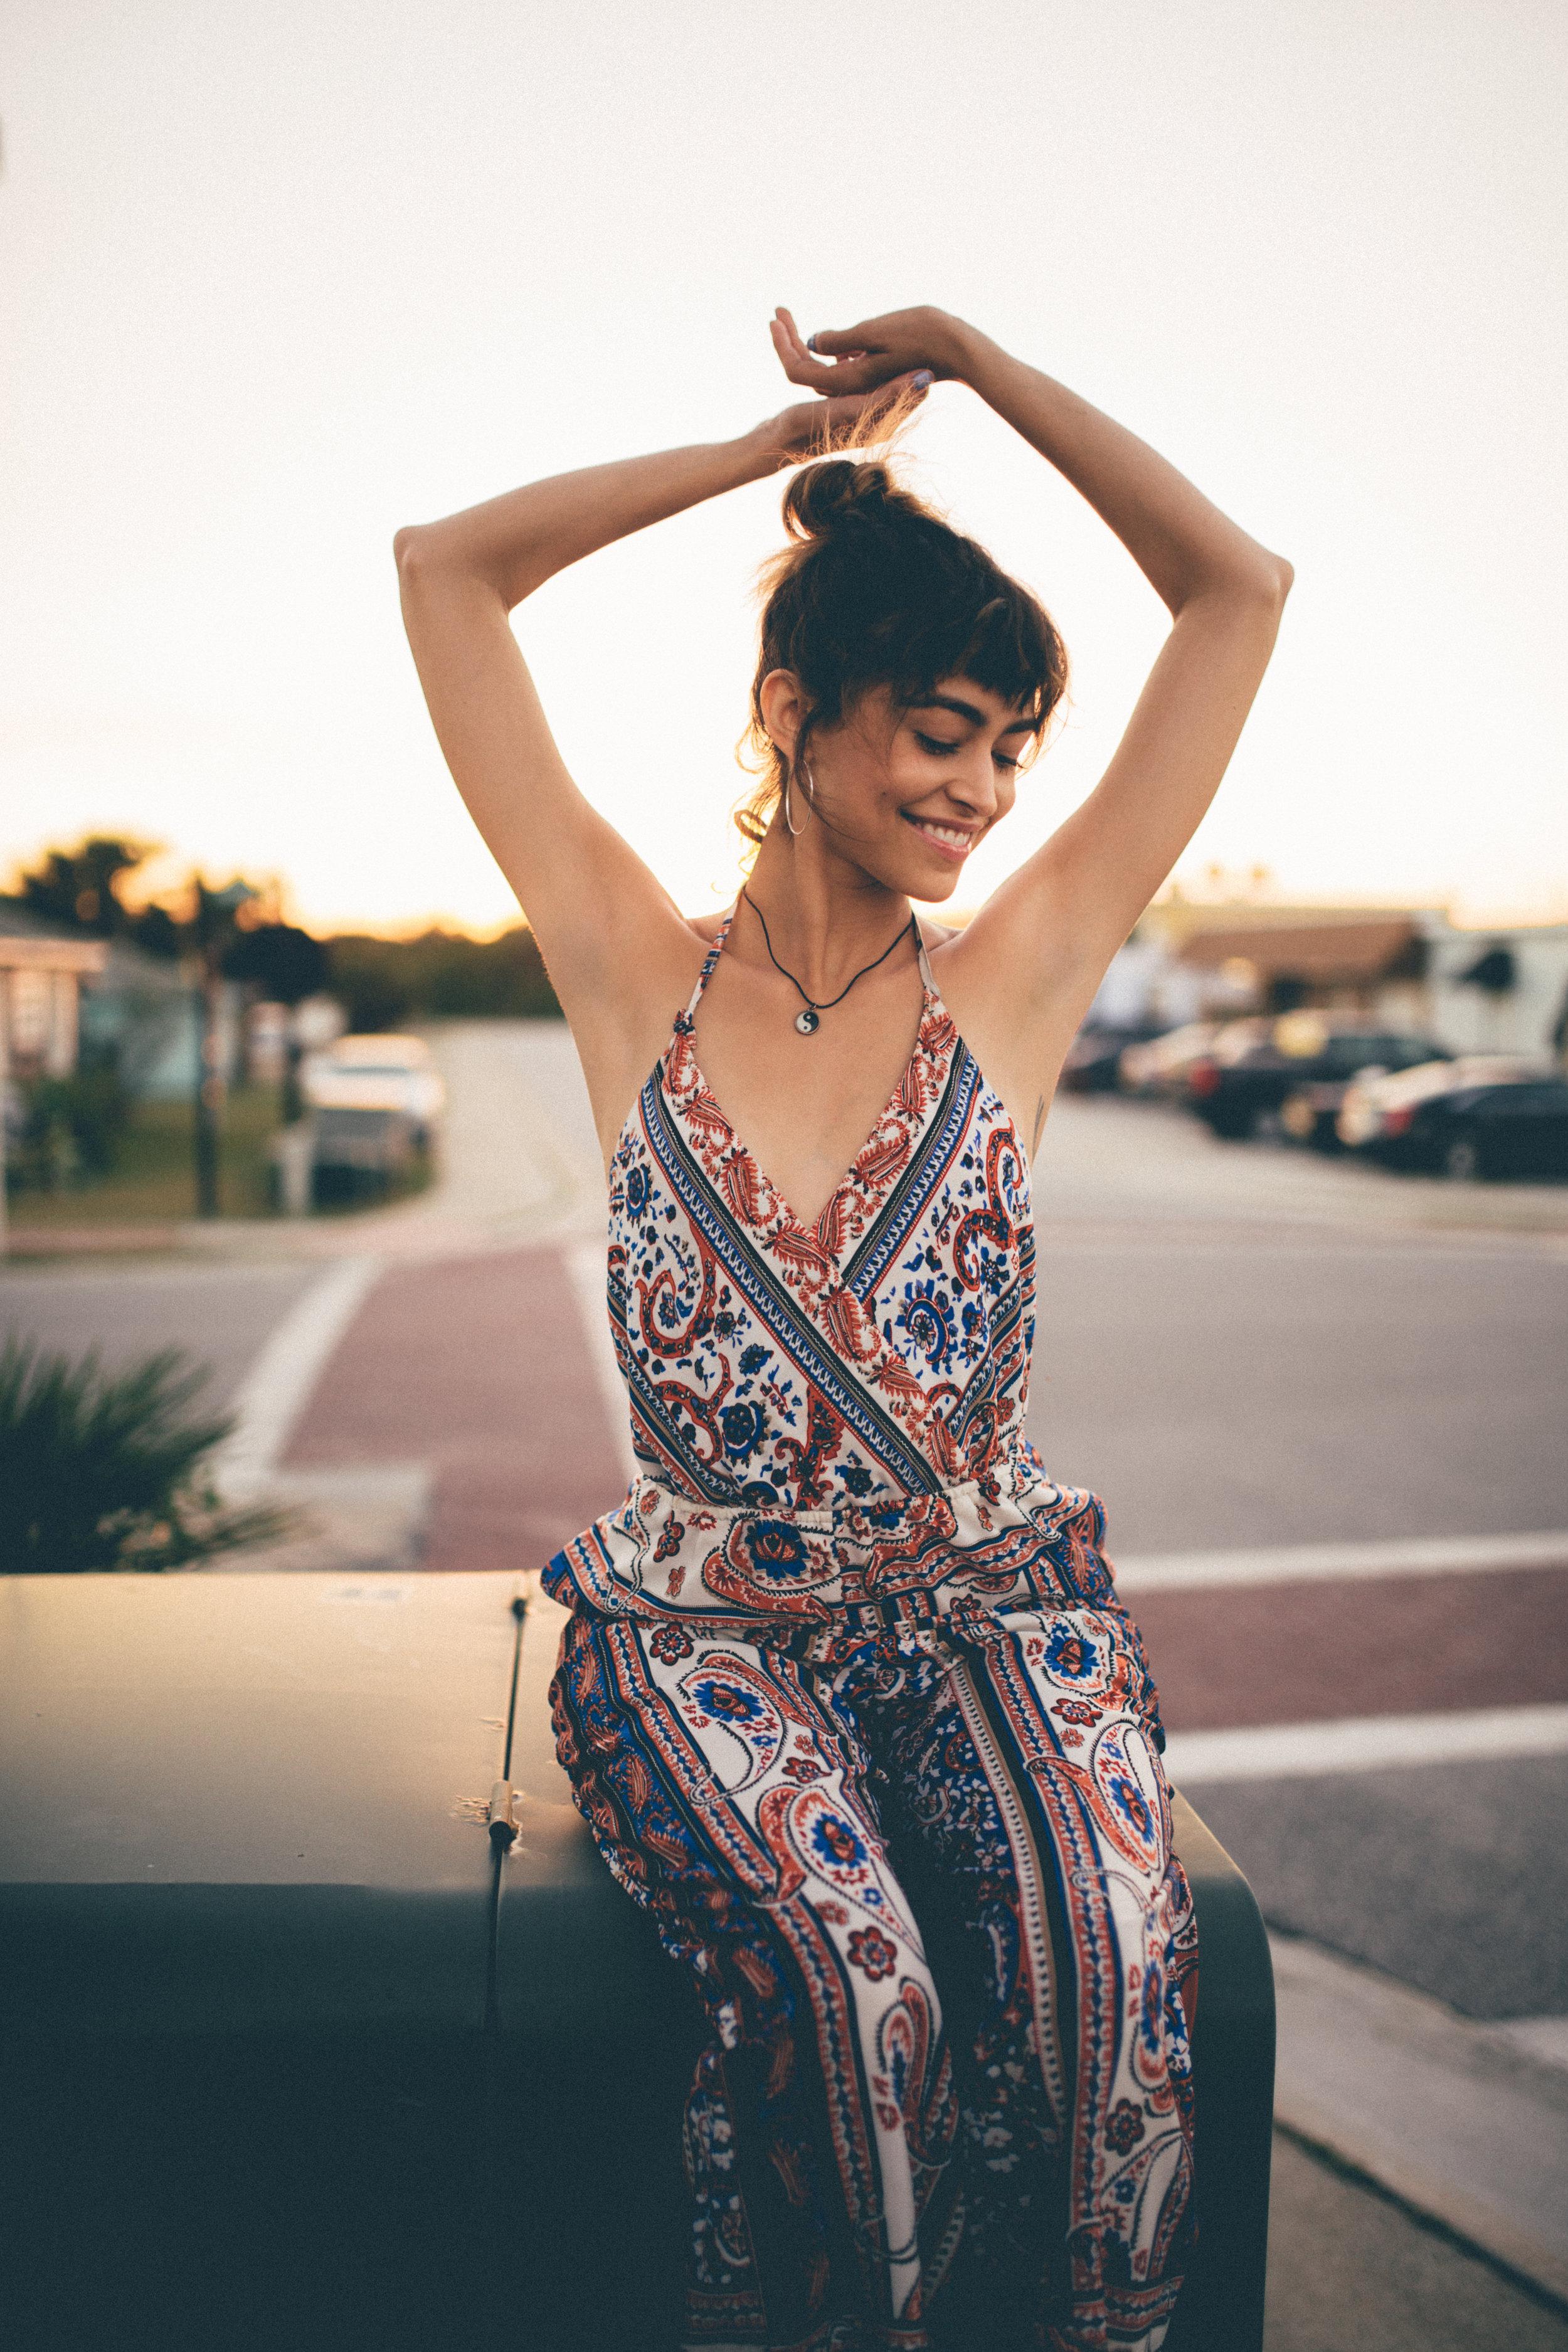 florida-portrait-photographer-lifestyle-model